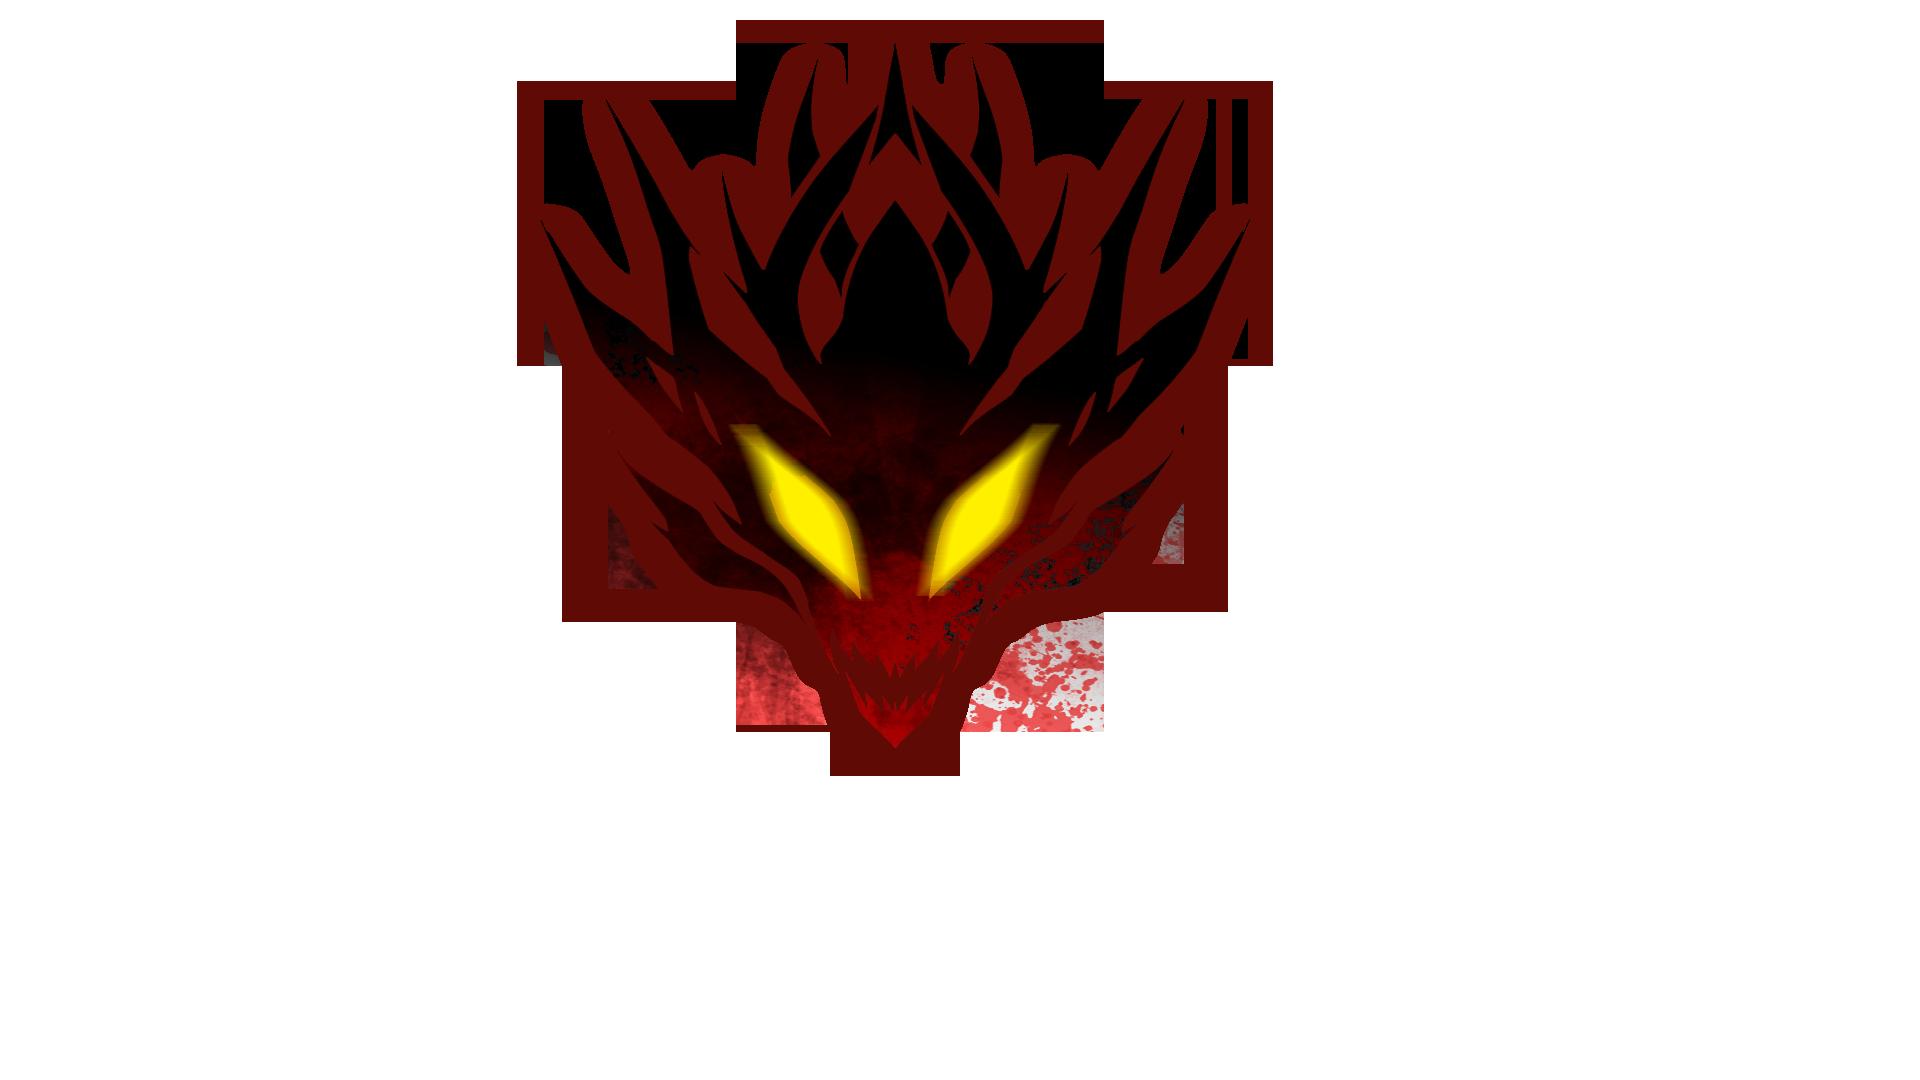 Dragon symbol by cvsnb on deviantart boc dragon symbol by cvsnb boc dragon symbol by cvsnb biocorpaavc Image collections